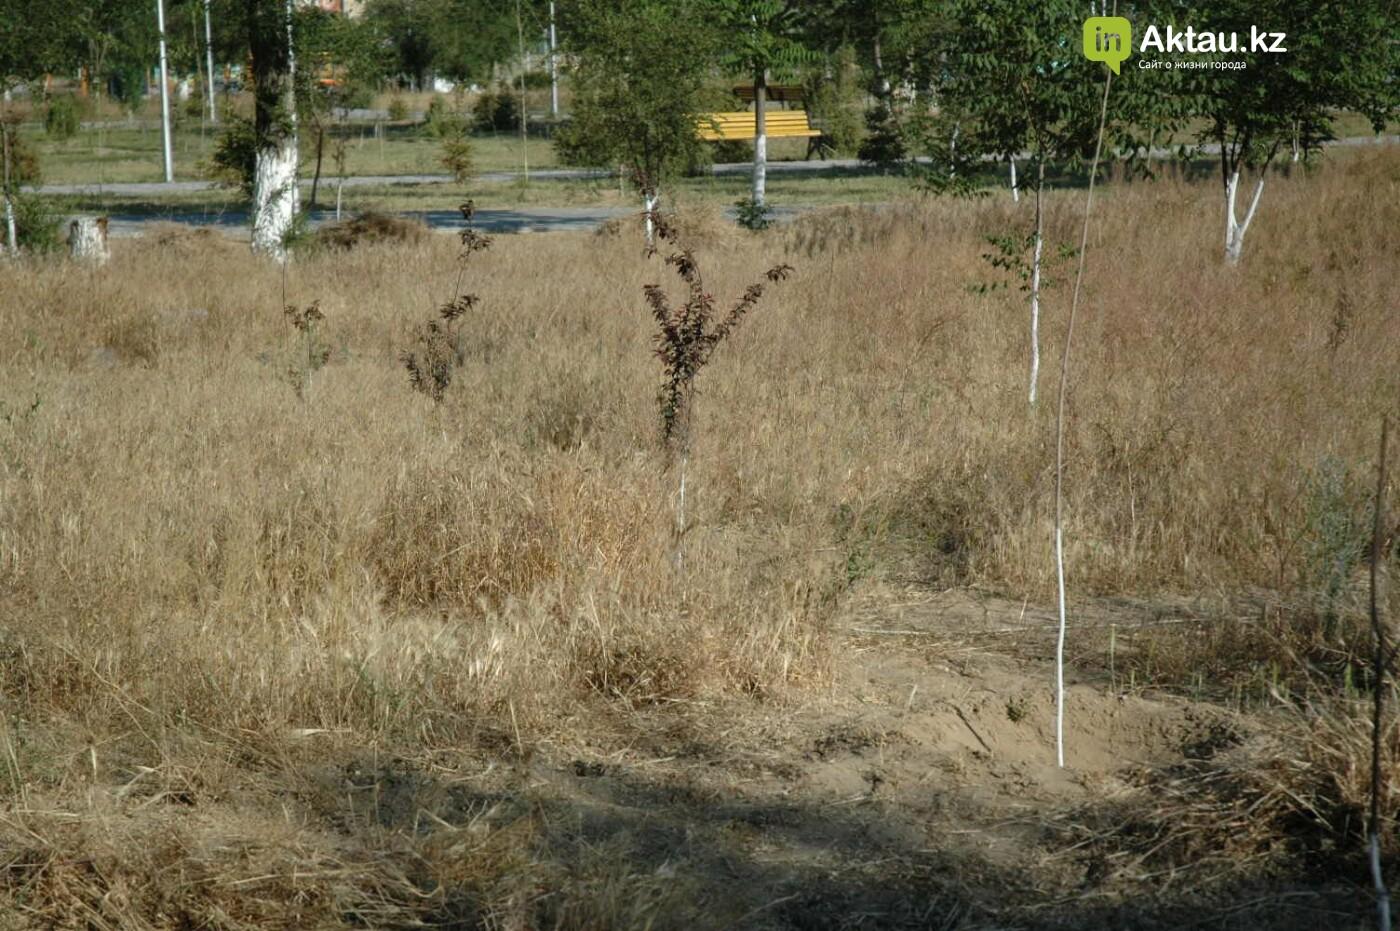 Погибшие от засухи и обезвоживания в Актау исчисляются десятками (ФОТО), фото-41